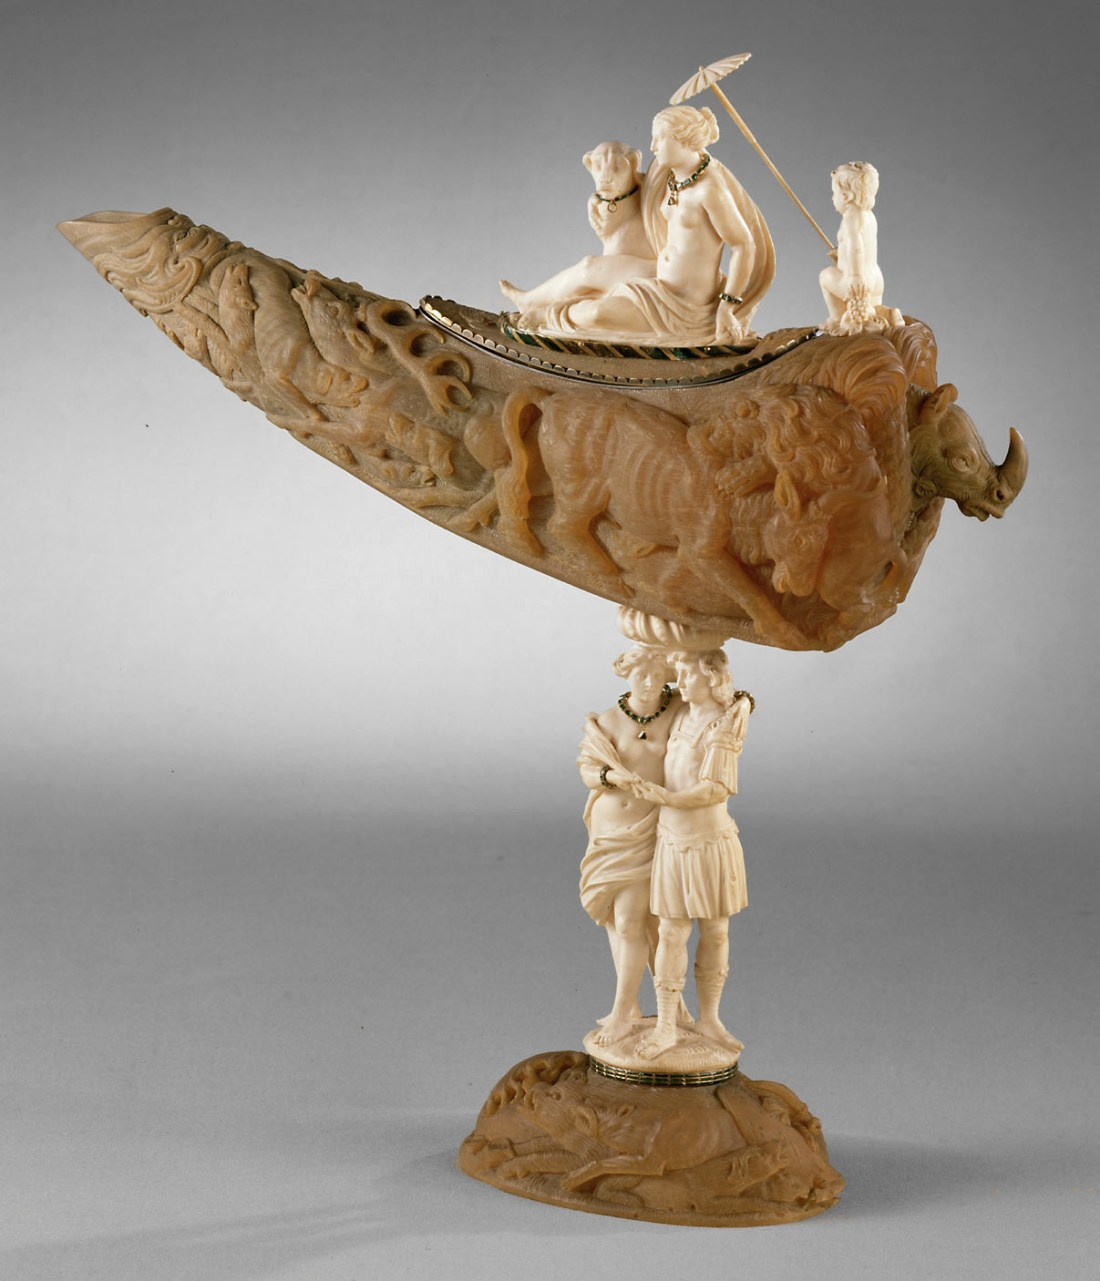 Ceremonial vessel. 1750-1775.